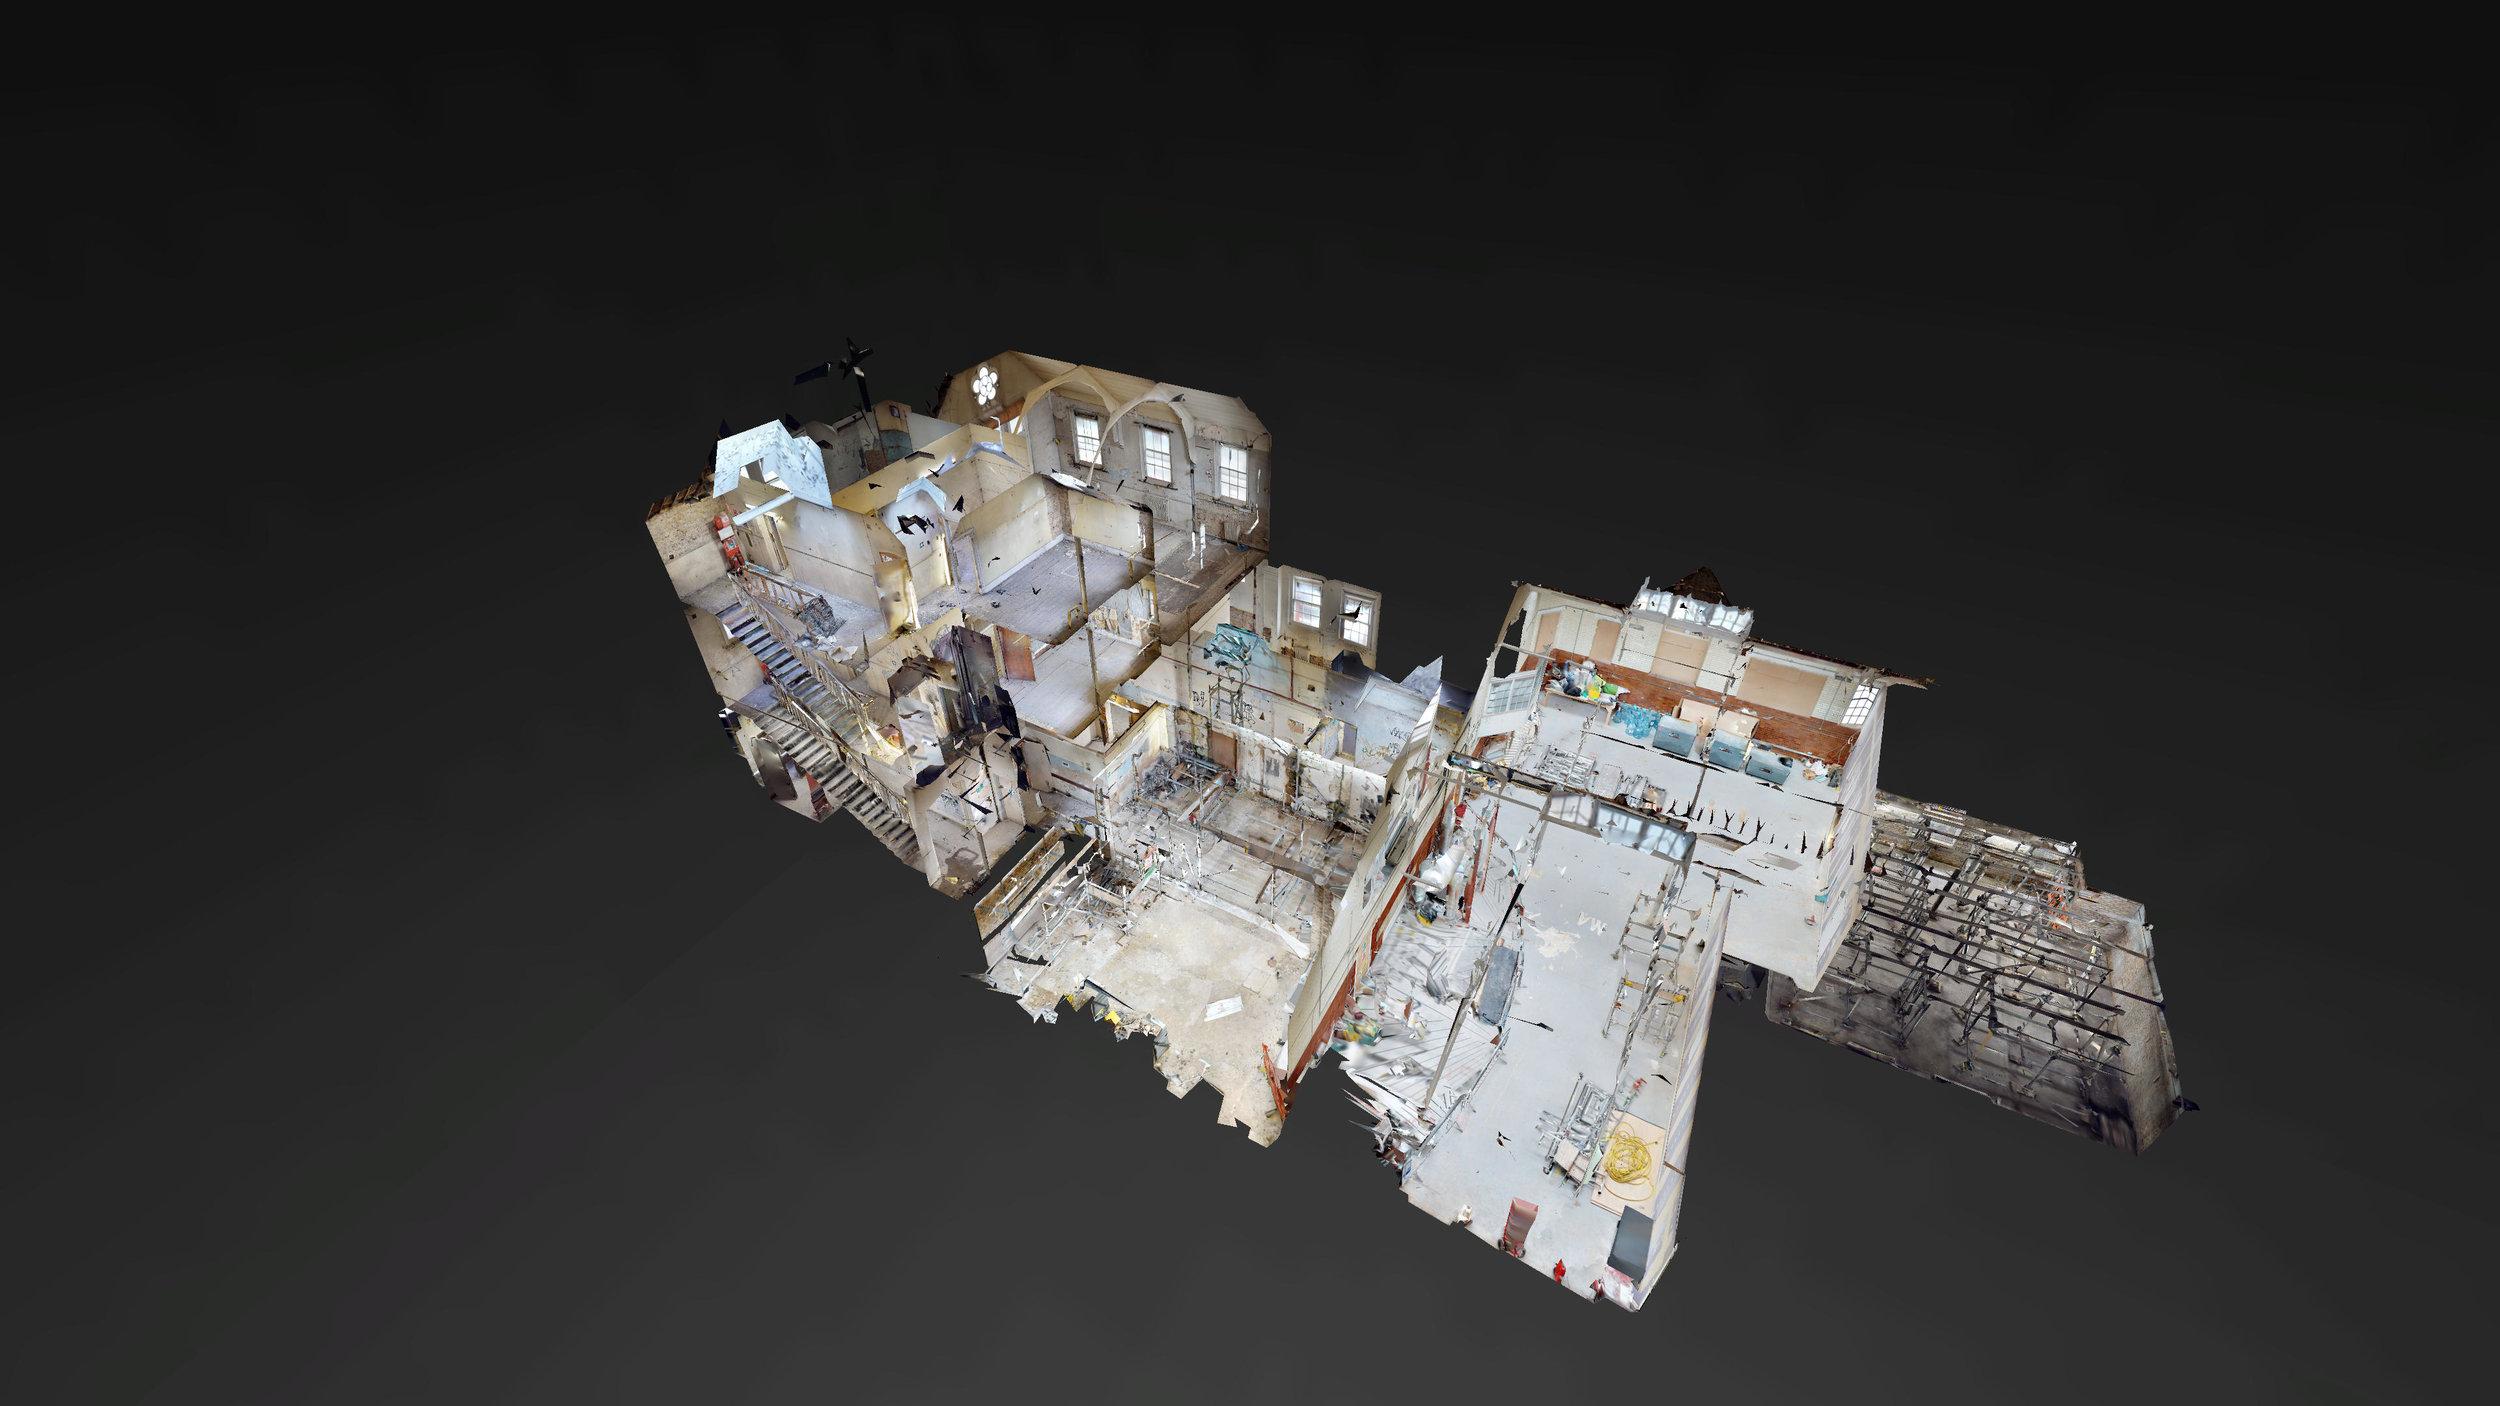 PmRyVfxQHSJ - 3D Model view.jpg